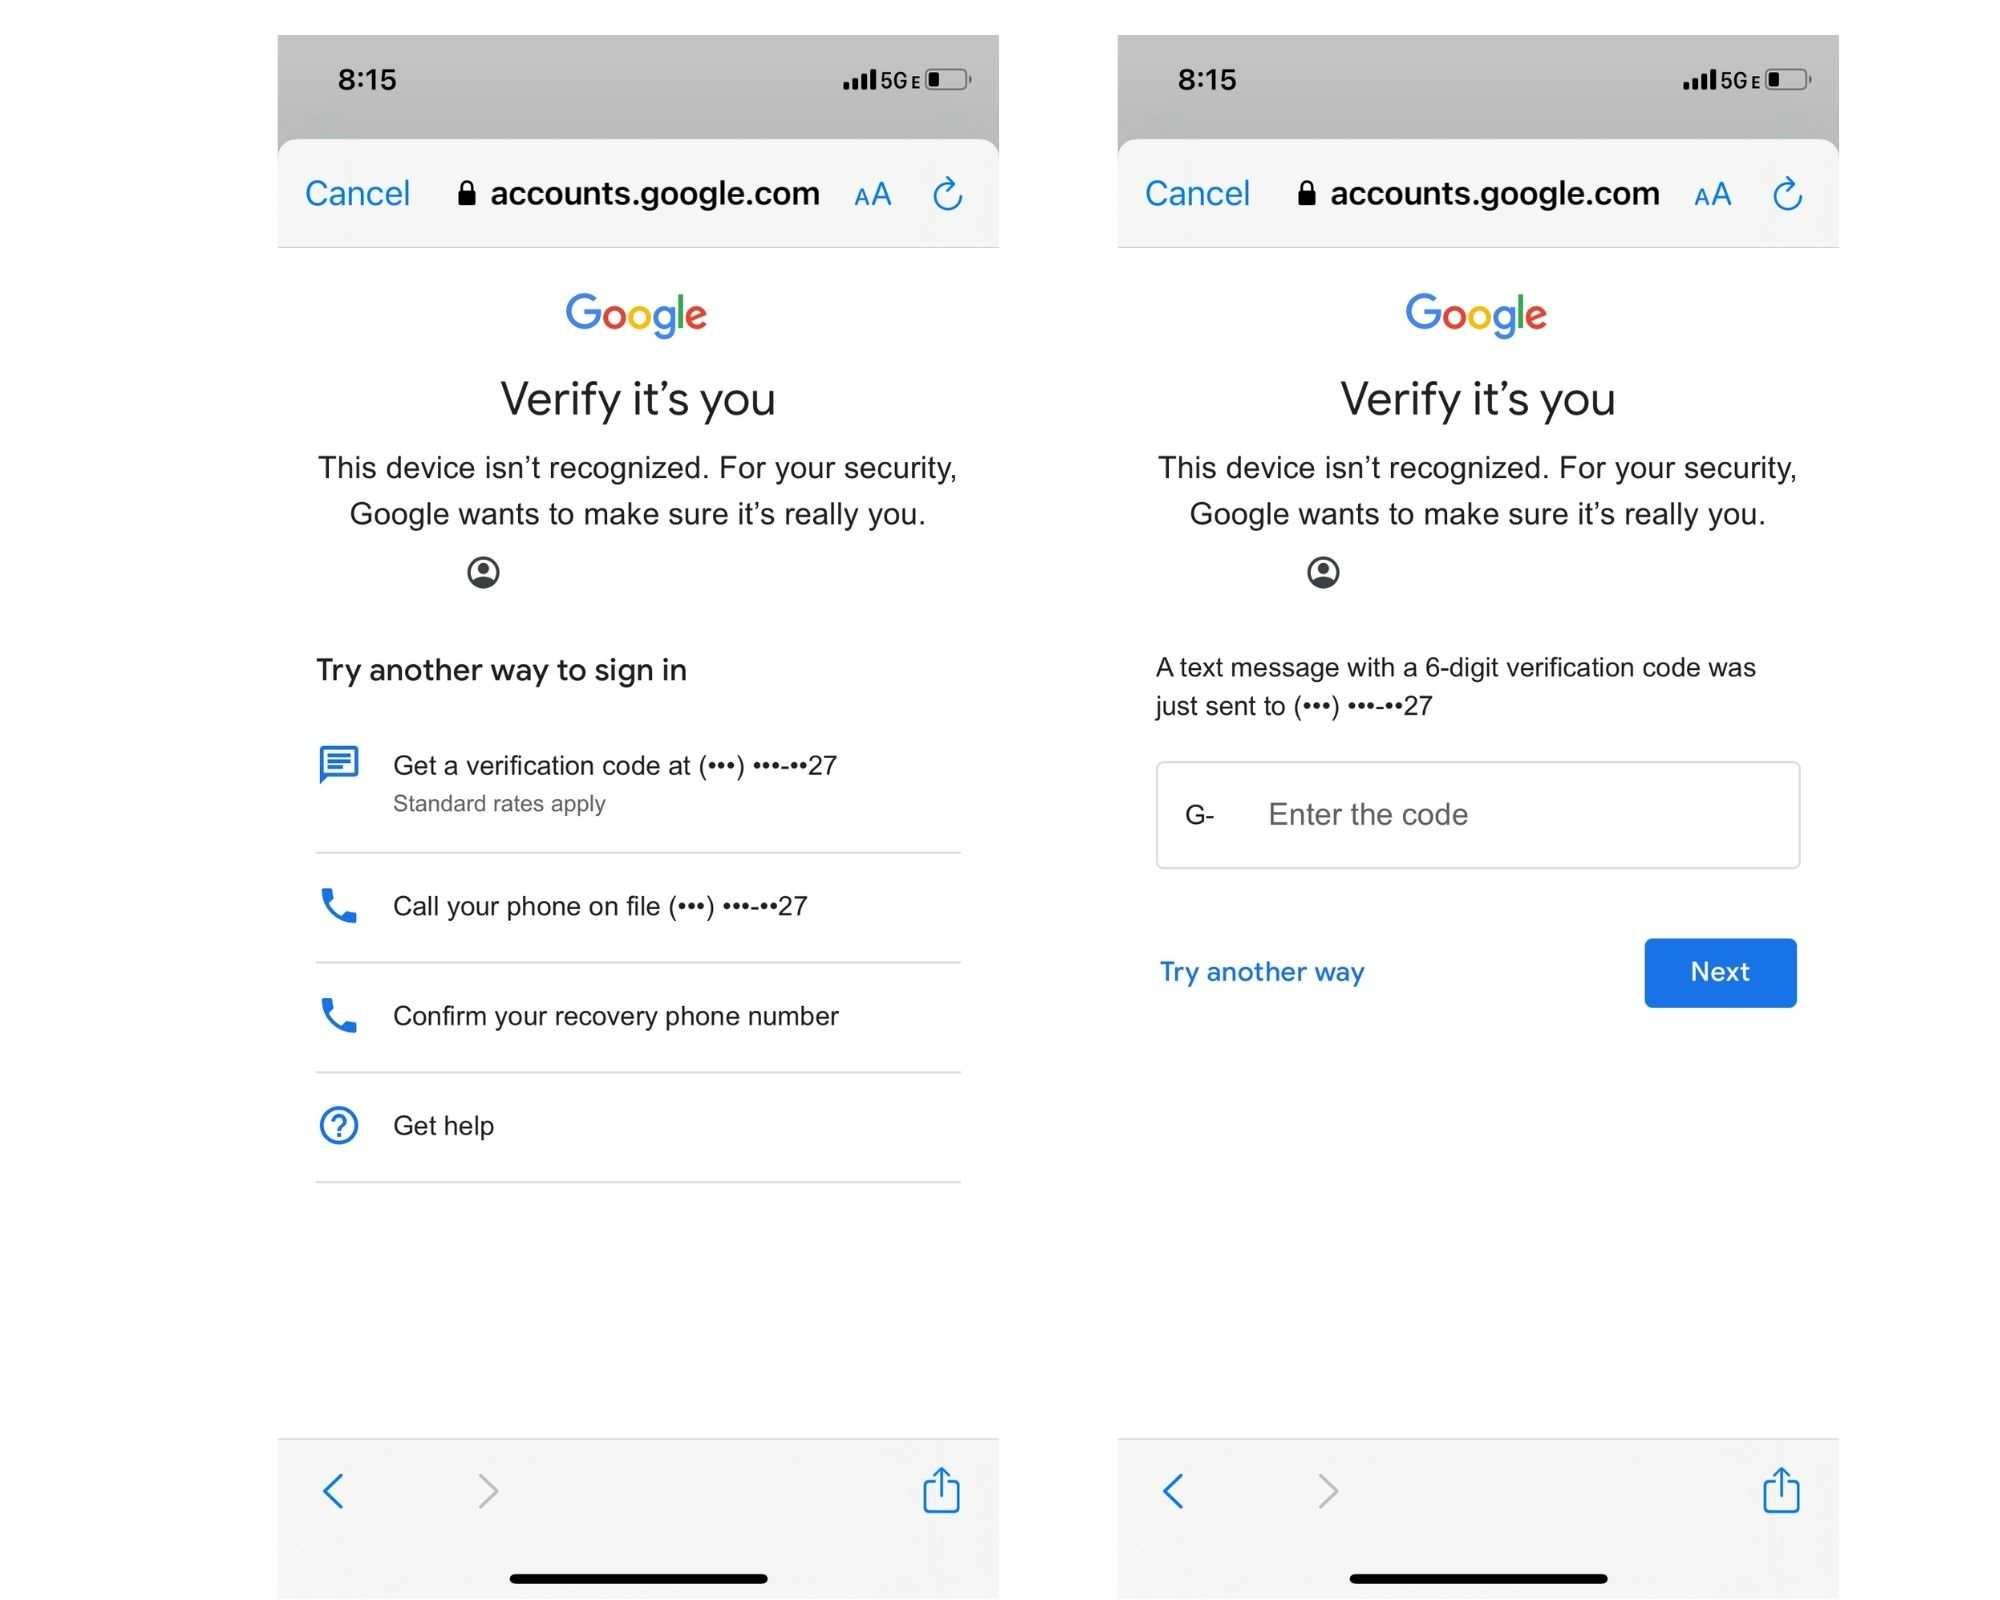 Gmail 需要 OTP 验证才能在新设备上登录 Gmail。